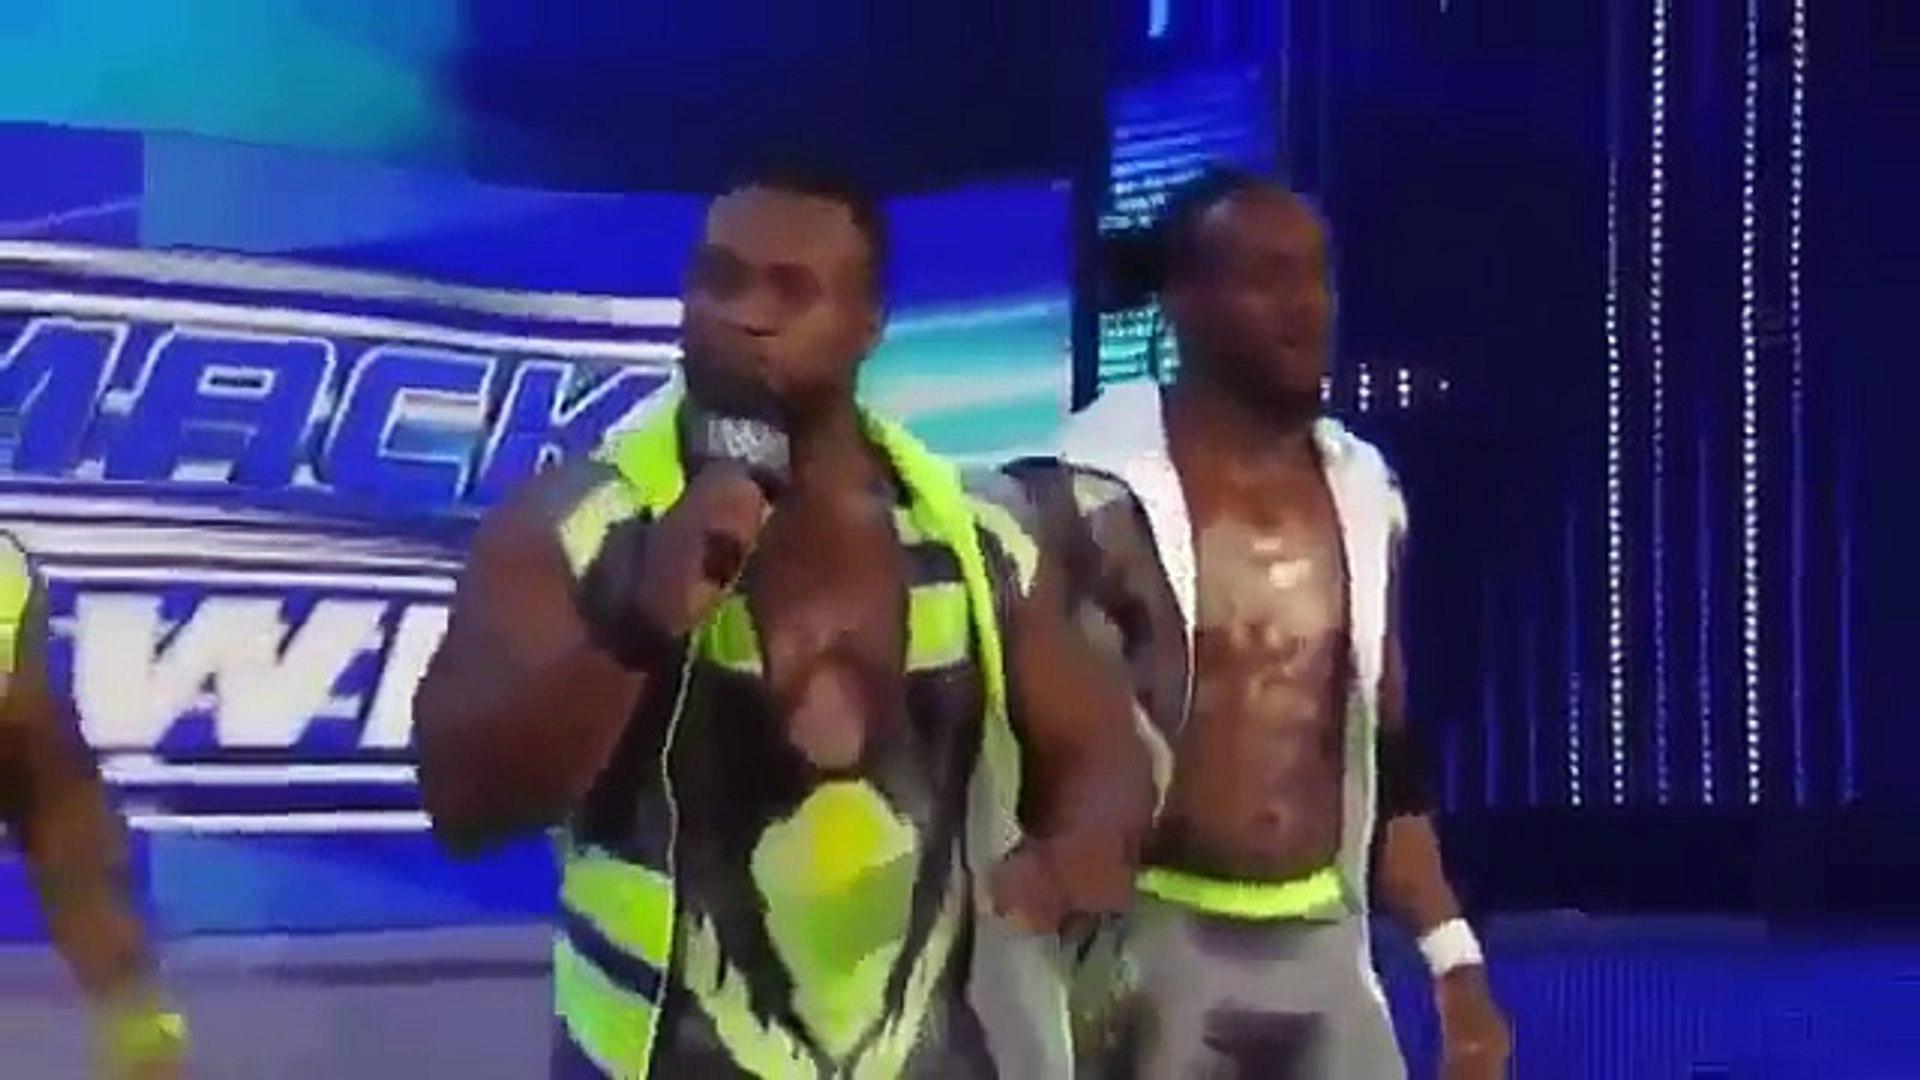 wwe WrestleMania 9 april 2015 full show wwe smackdown 4 _9 _15 full show wwe smackdown 2016 f